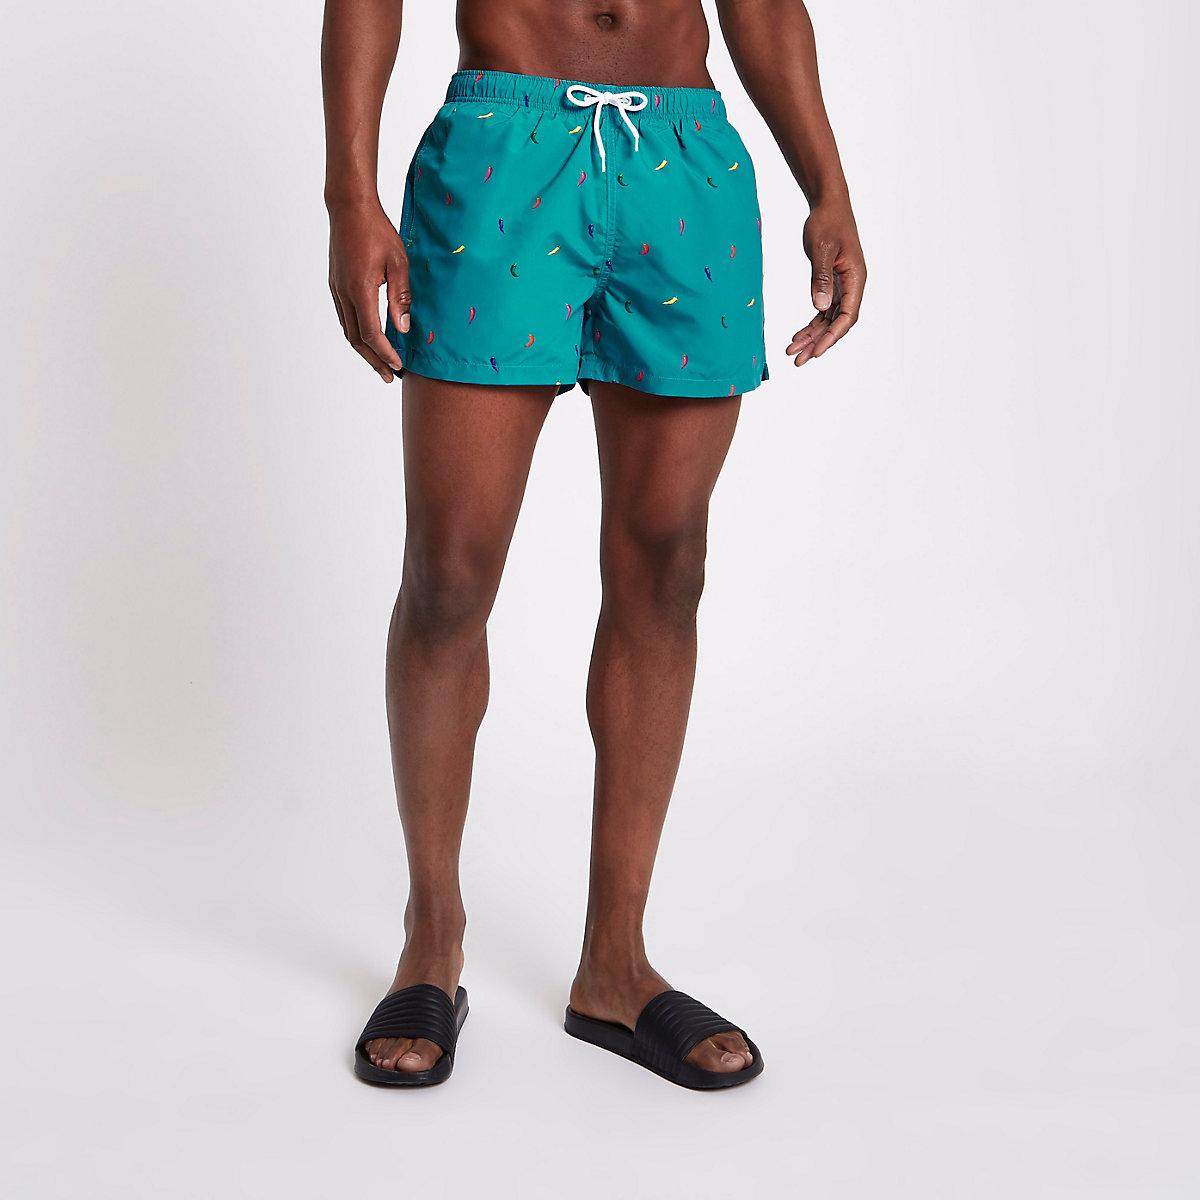 Green chilli print short swim trunks